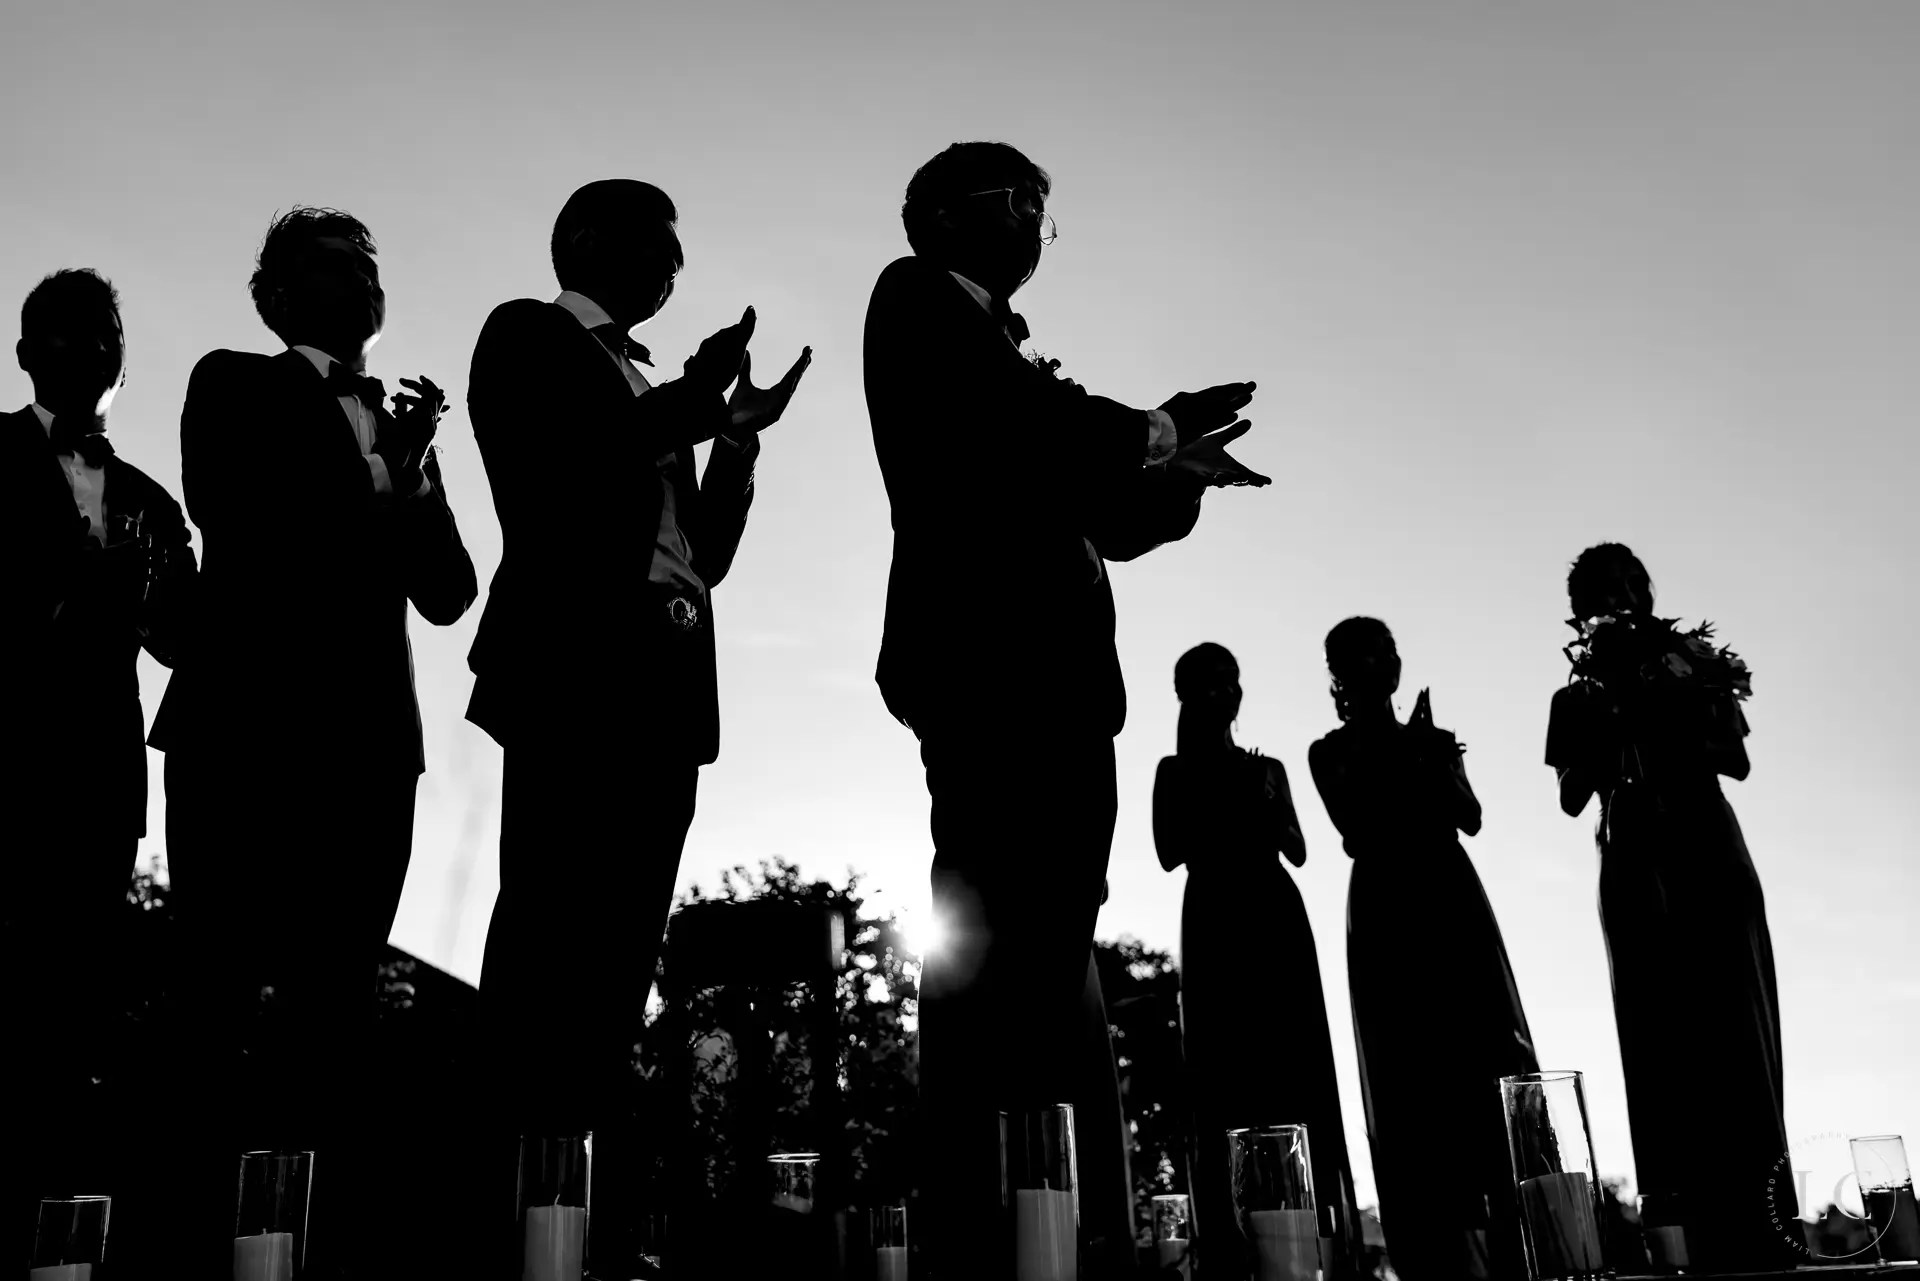 Bridesmaids and groomsmen shadow